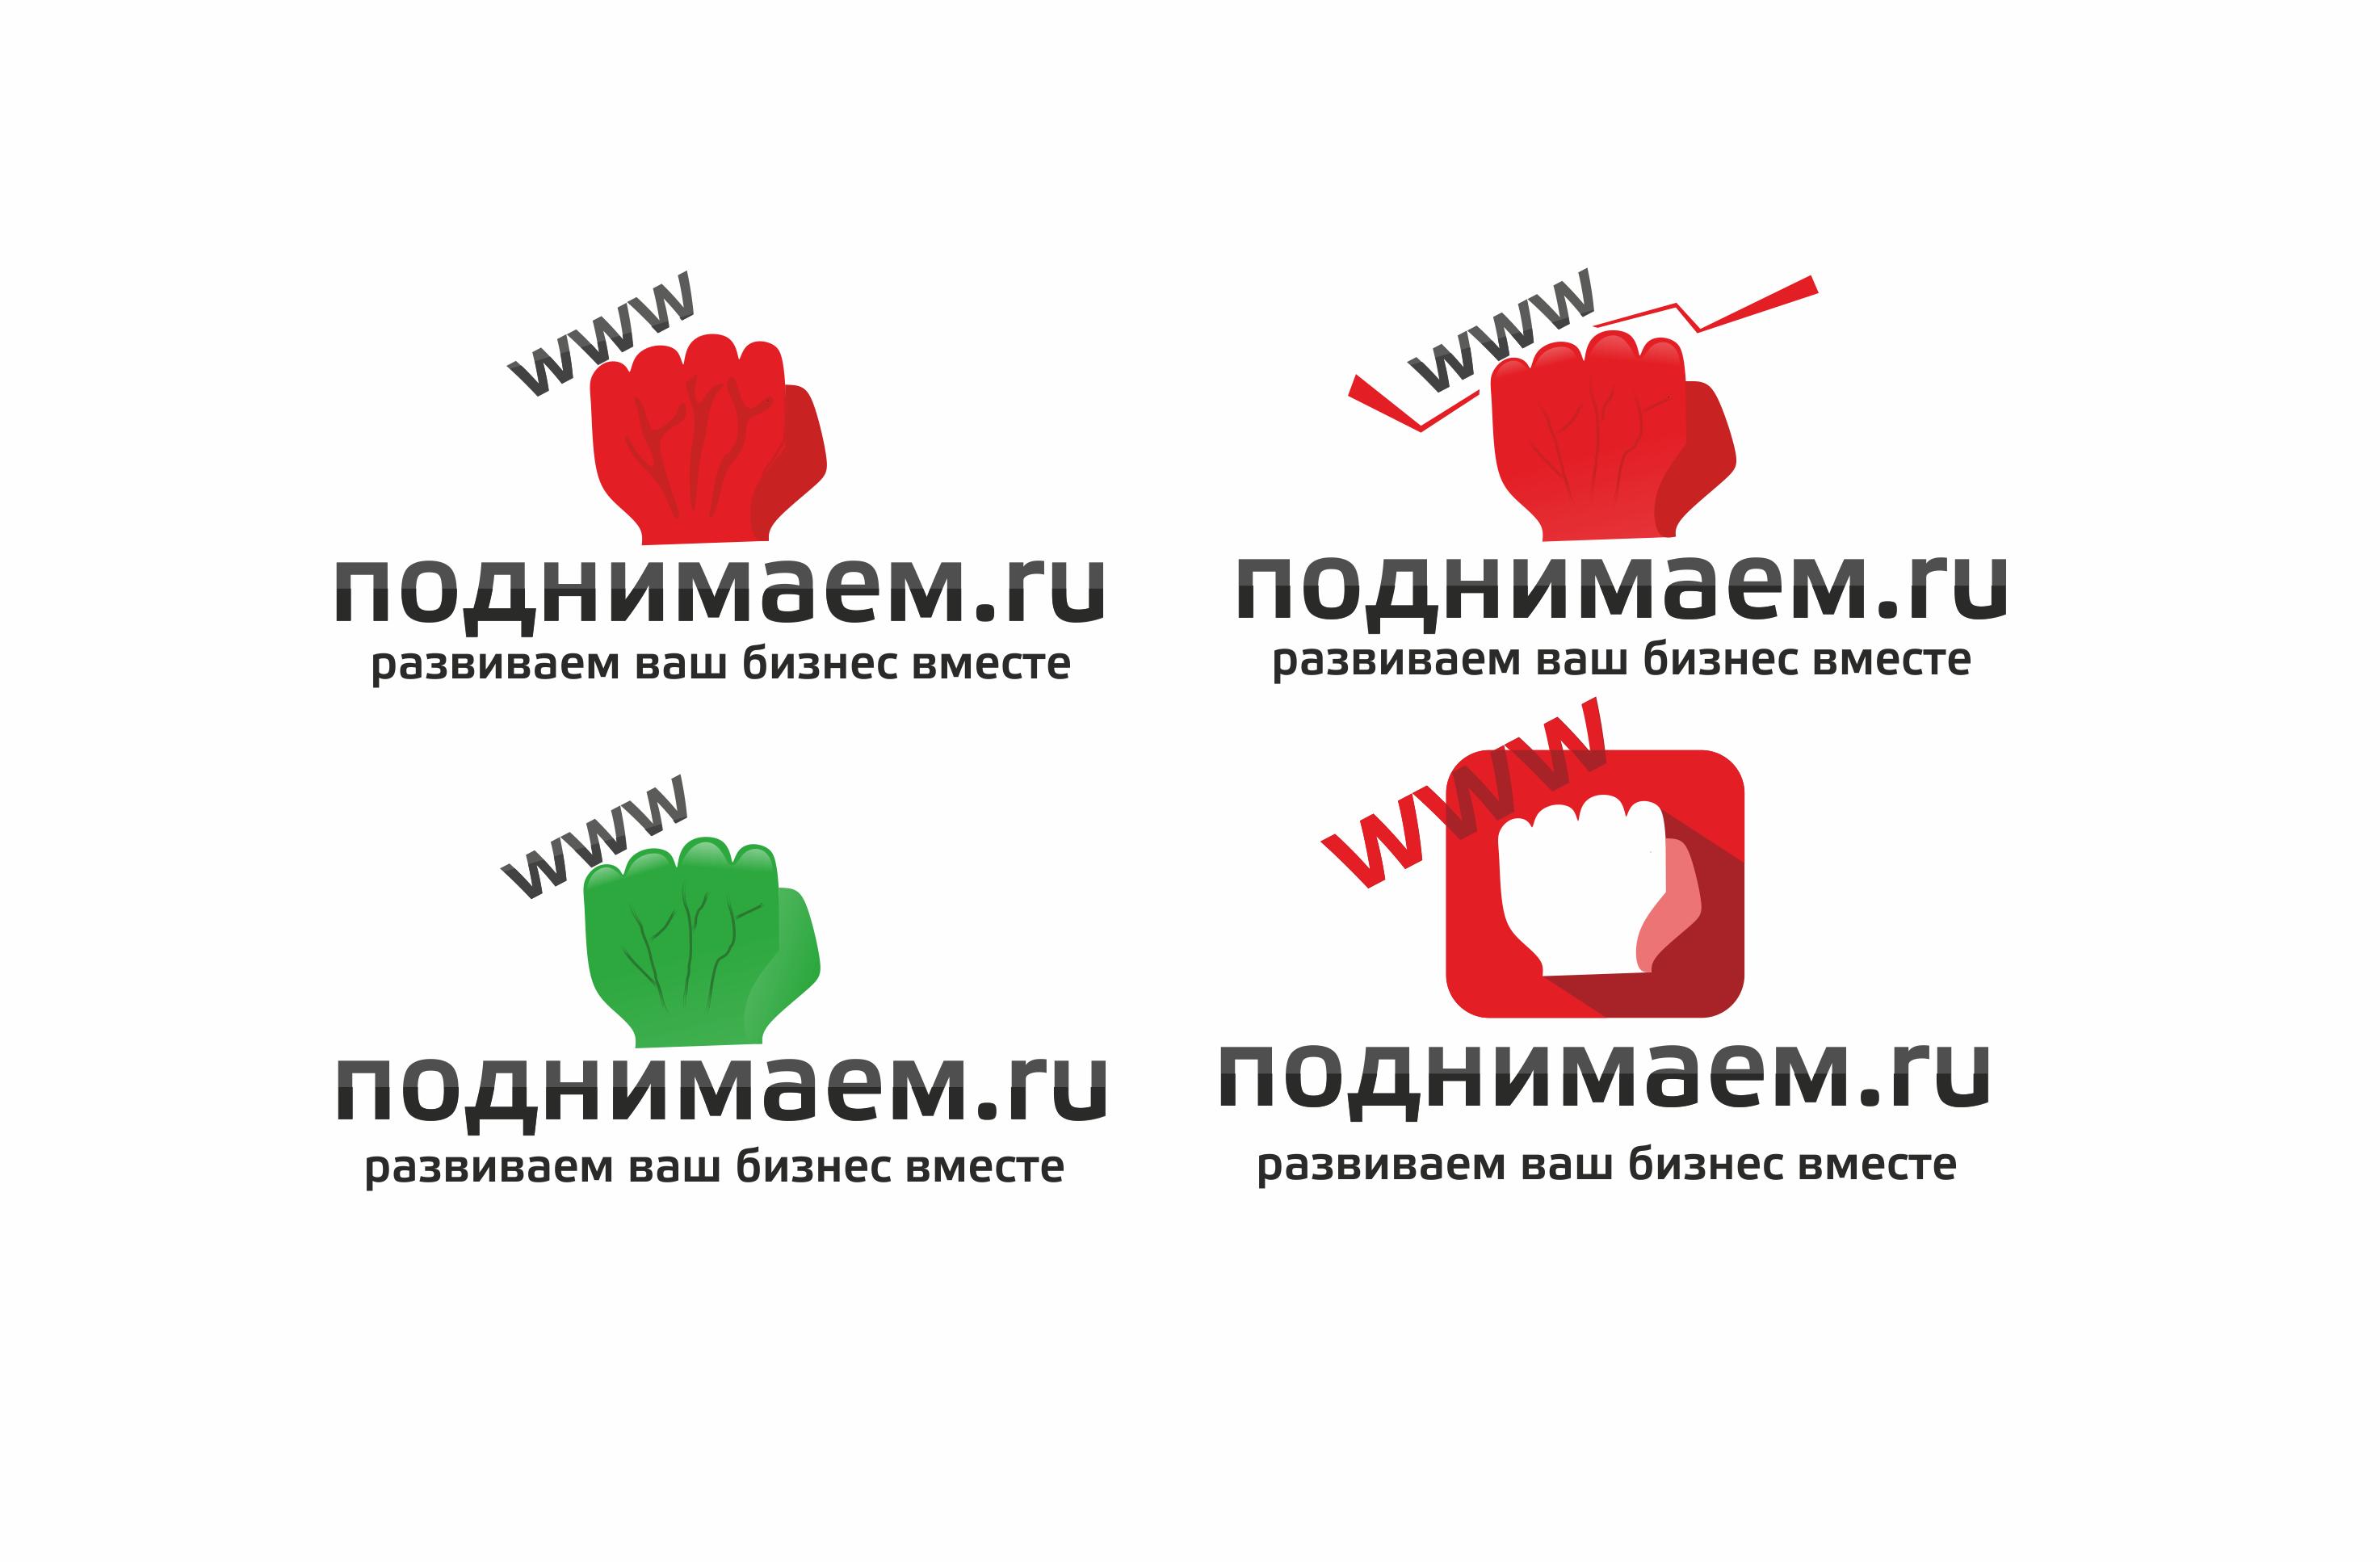 Разработать логотип + визитку + логотип для печати ООО +++ фото f_1855547a18ded34e.png